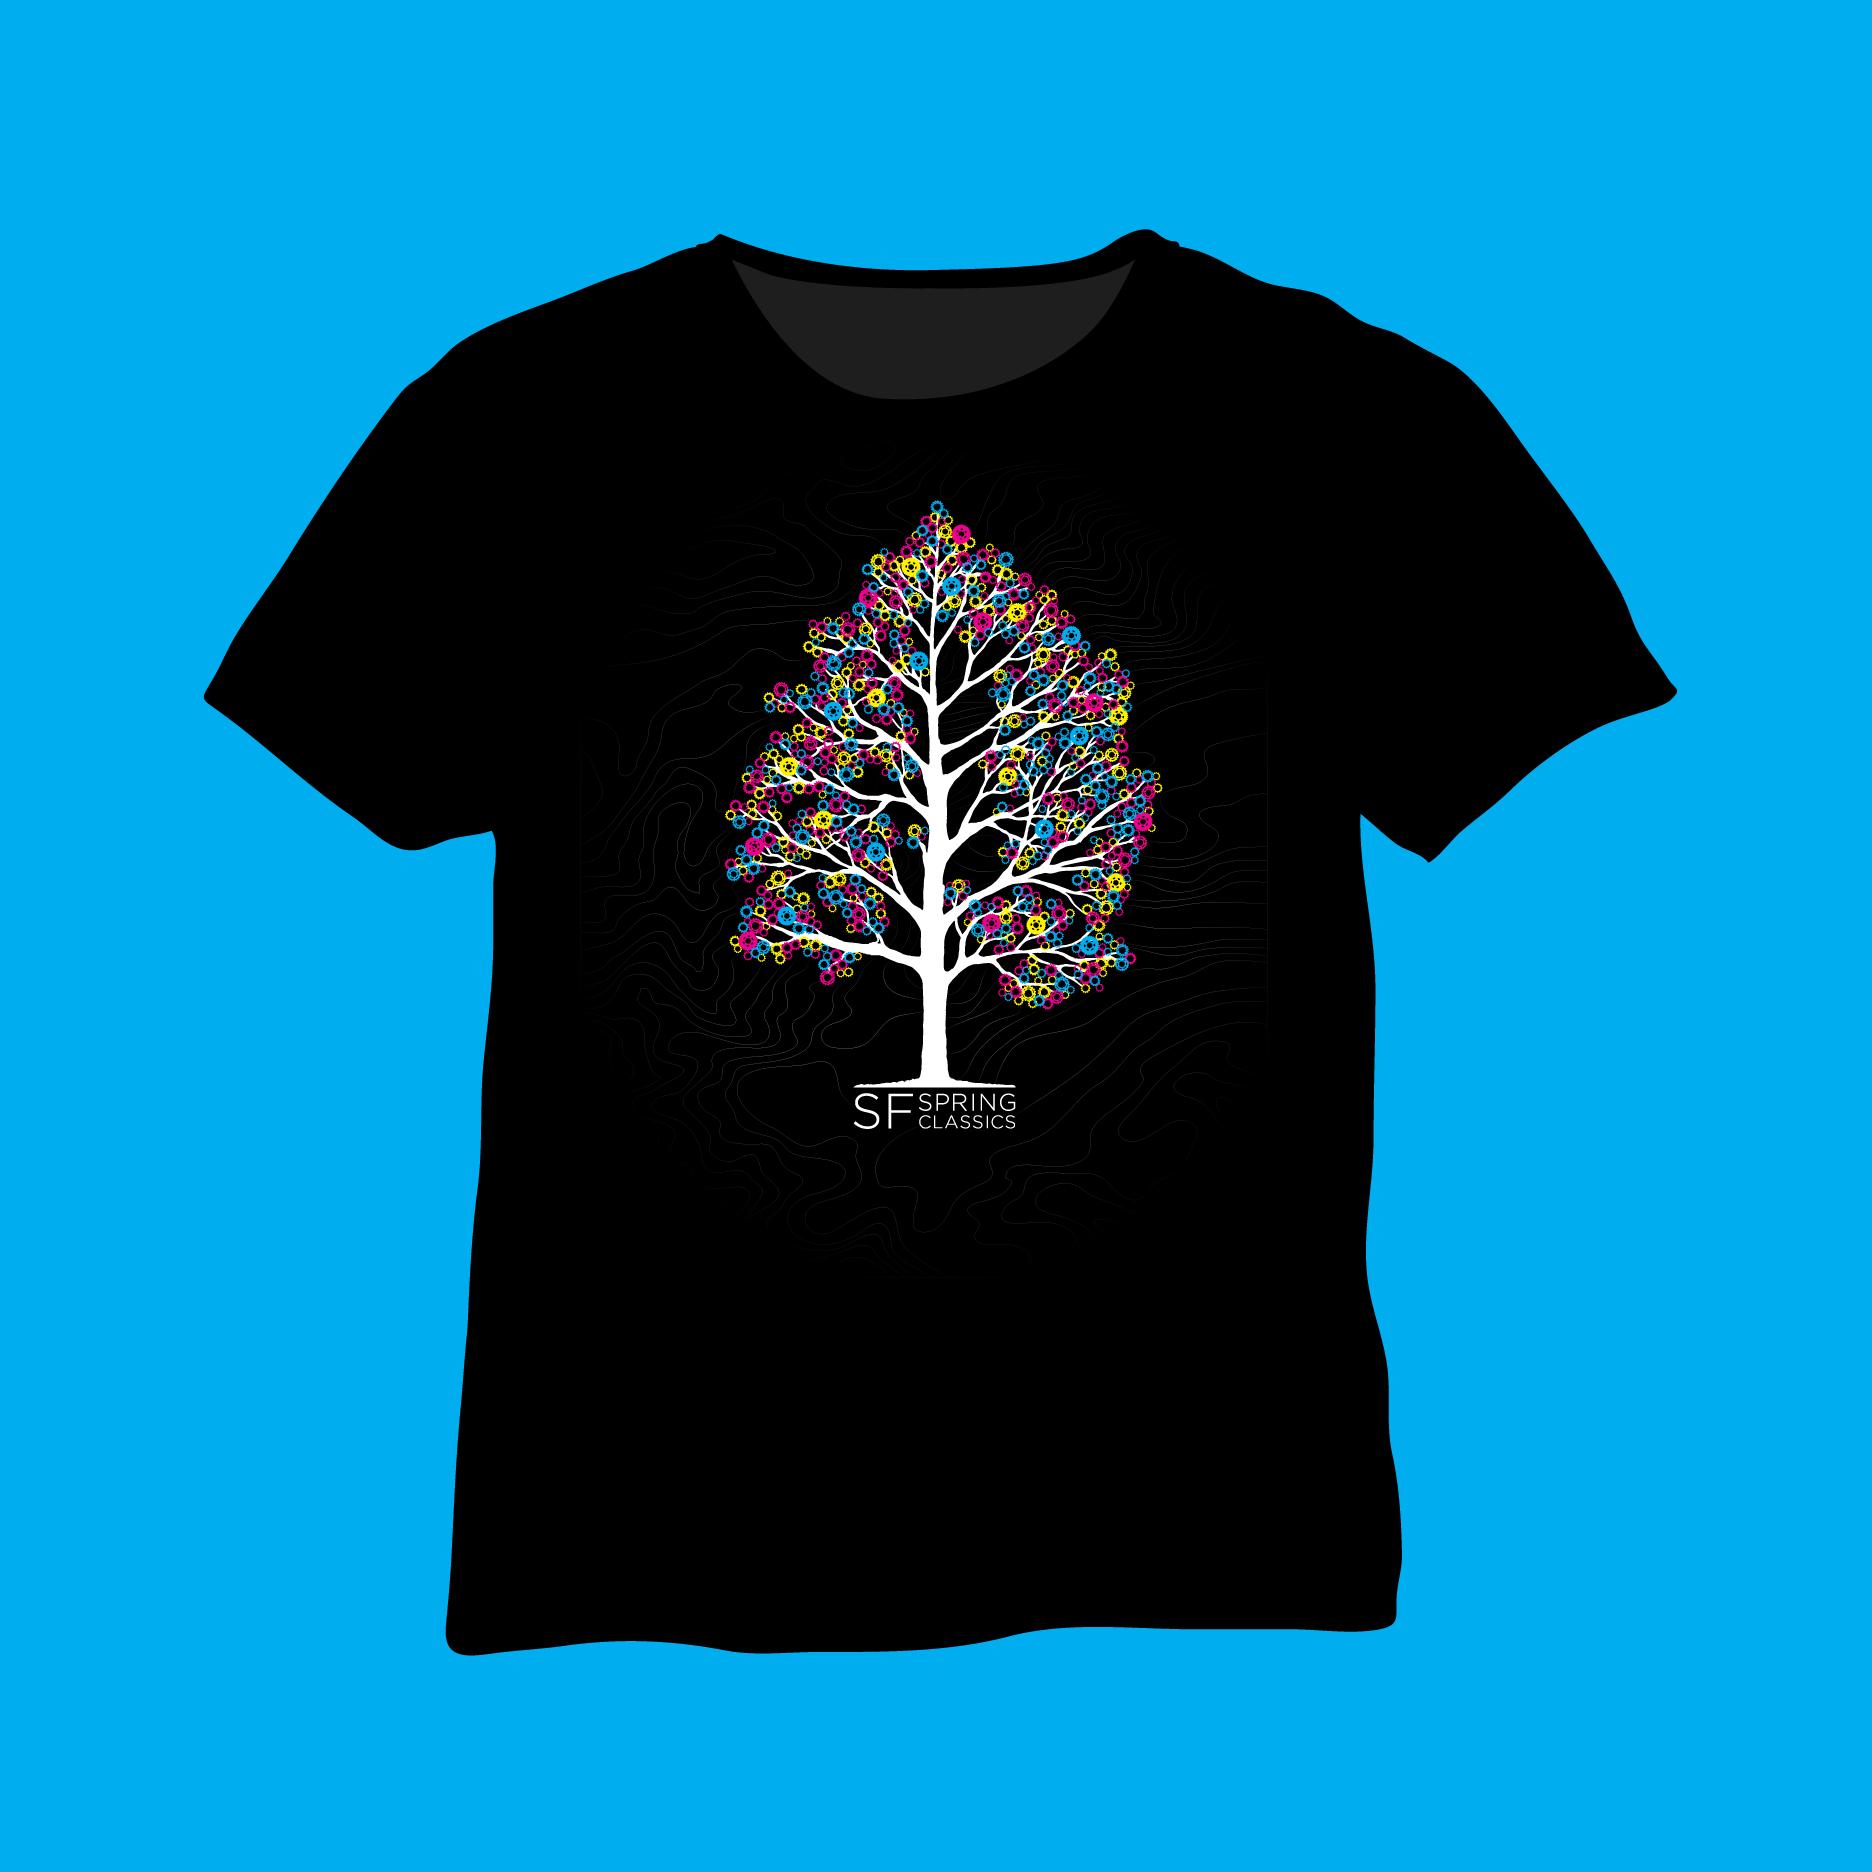 shirt_09.png